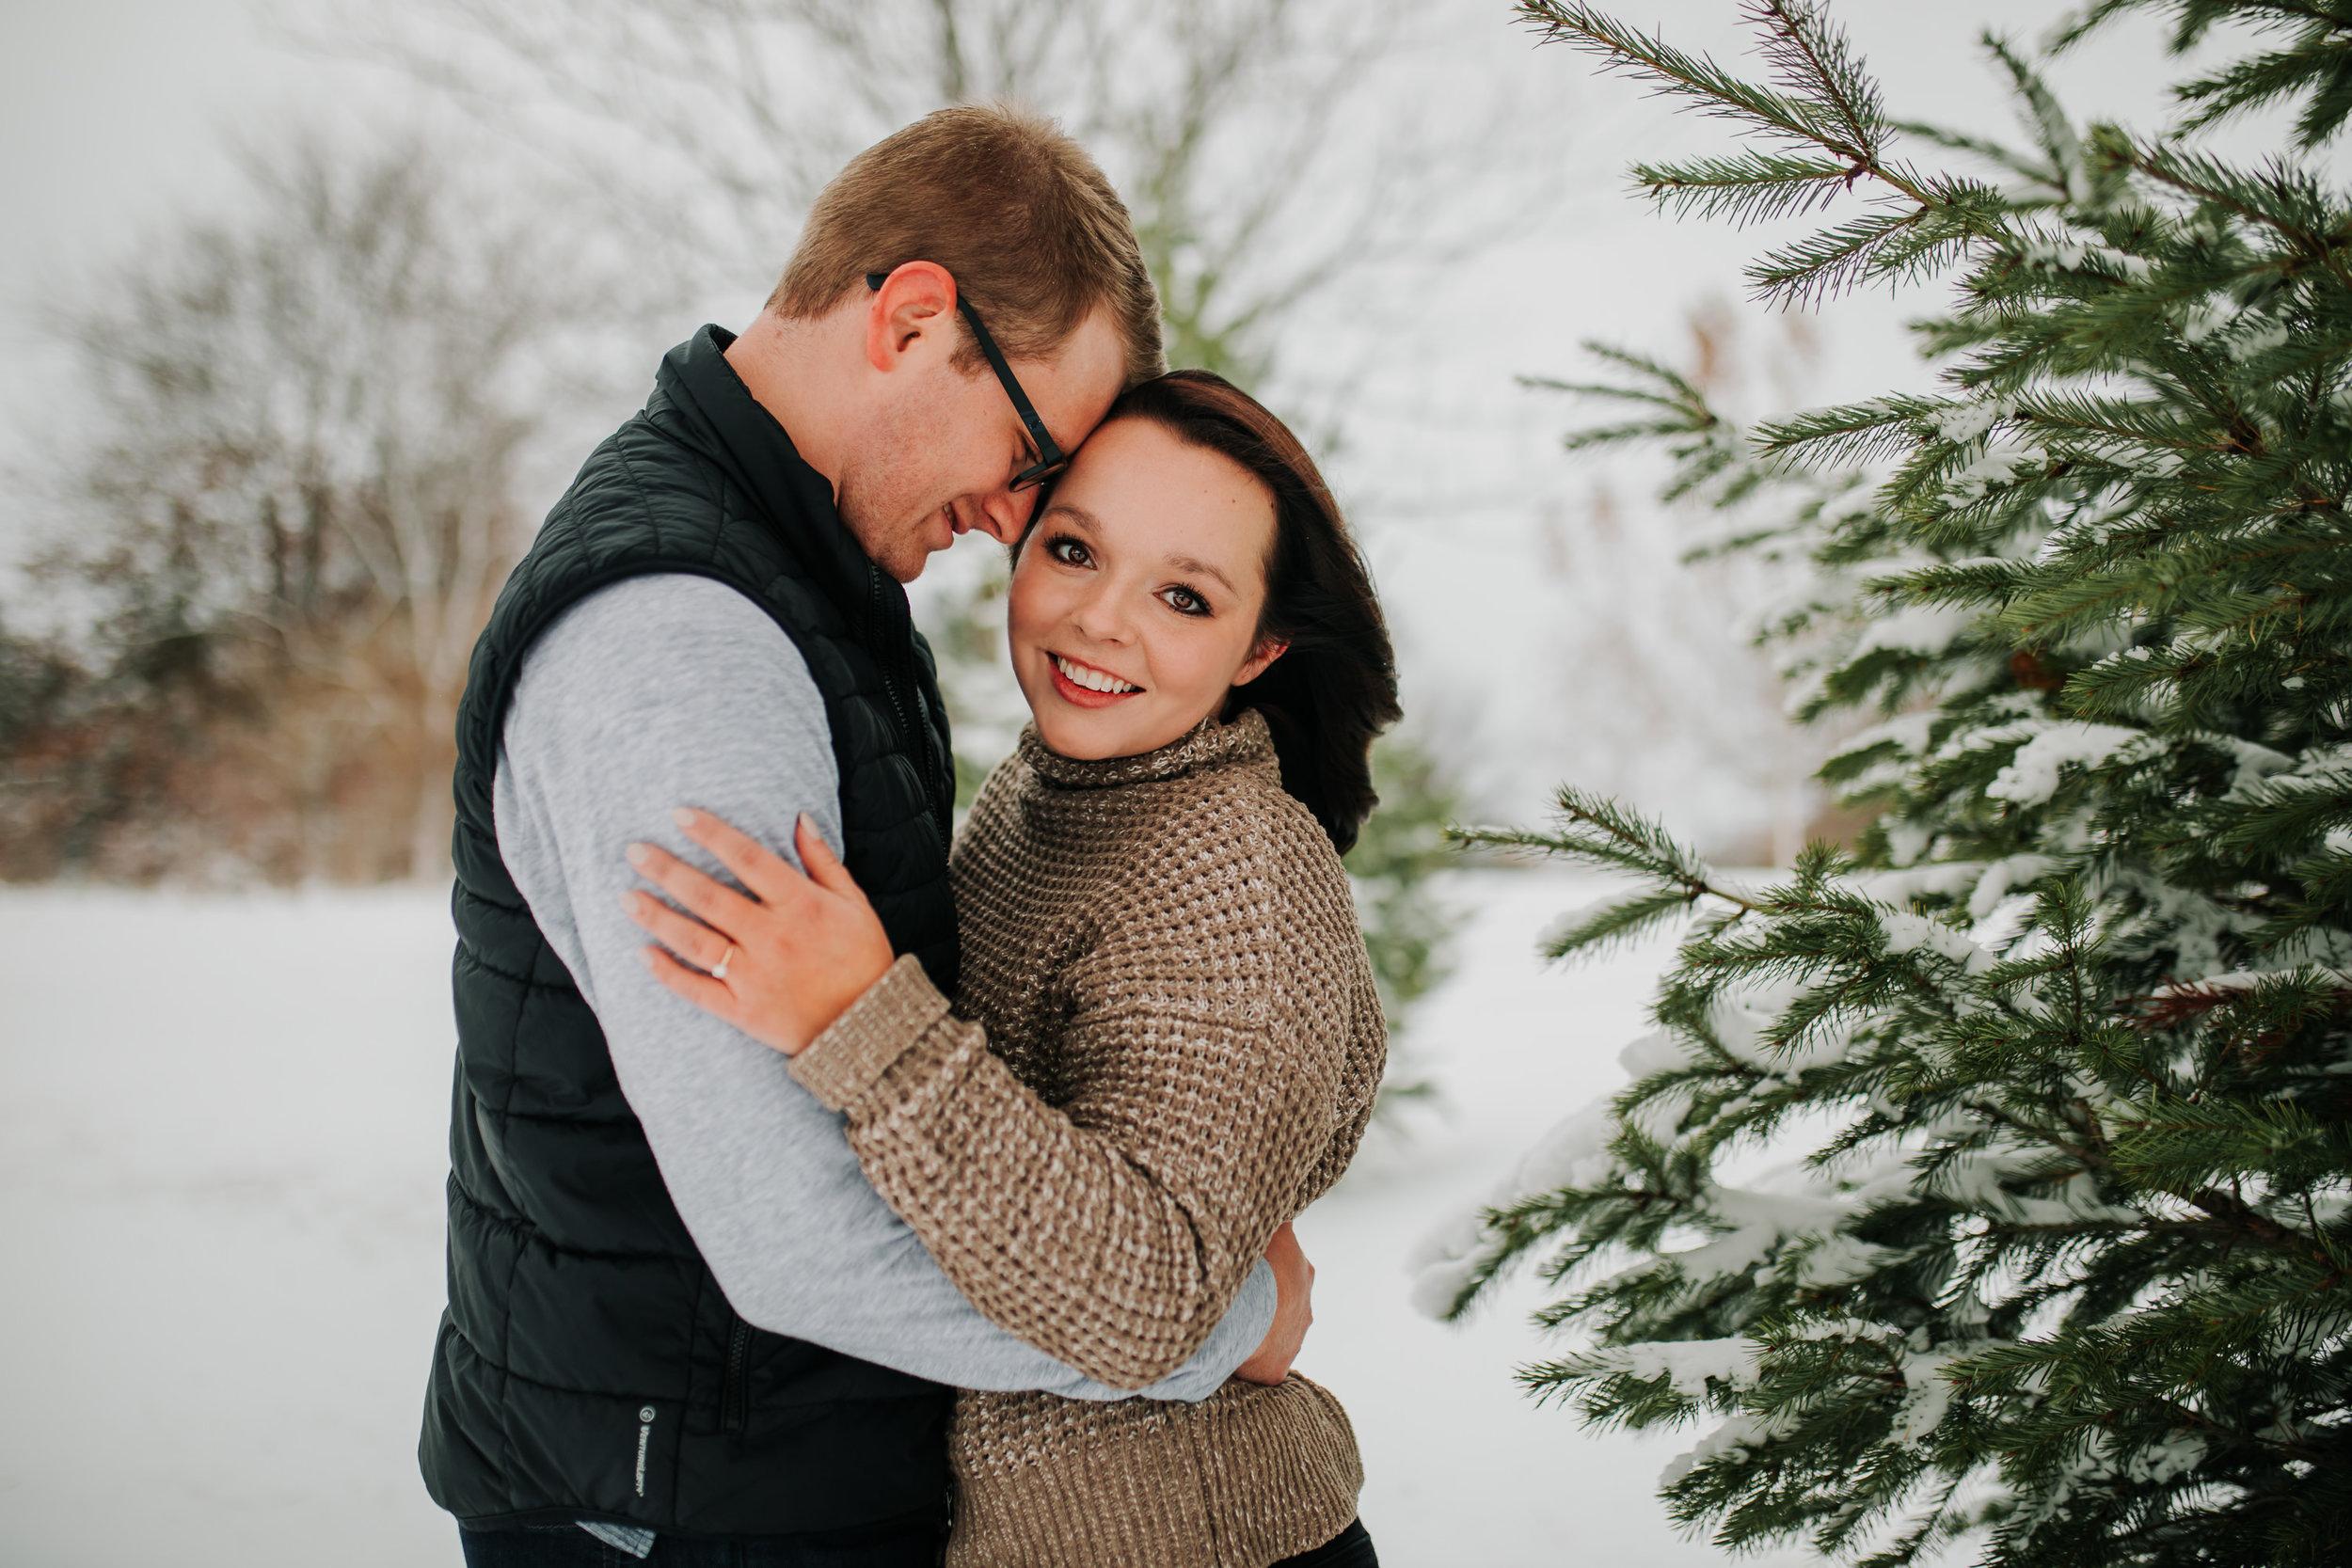 Vanessa & Dan - Engaged - Nathaniel Jensen Photography - Omaha Nebraska Wedding Photographer - Standing Bear Lake - Snowy Engagement Session-51.jpg